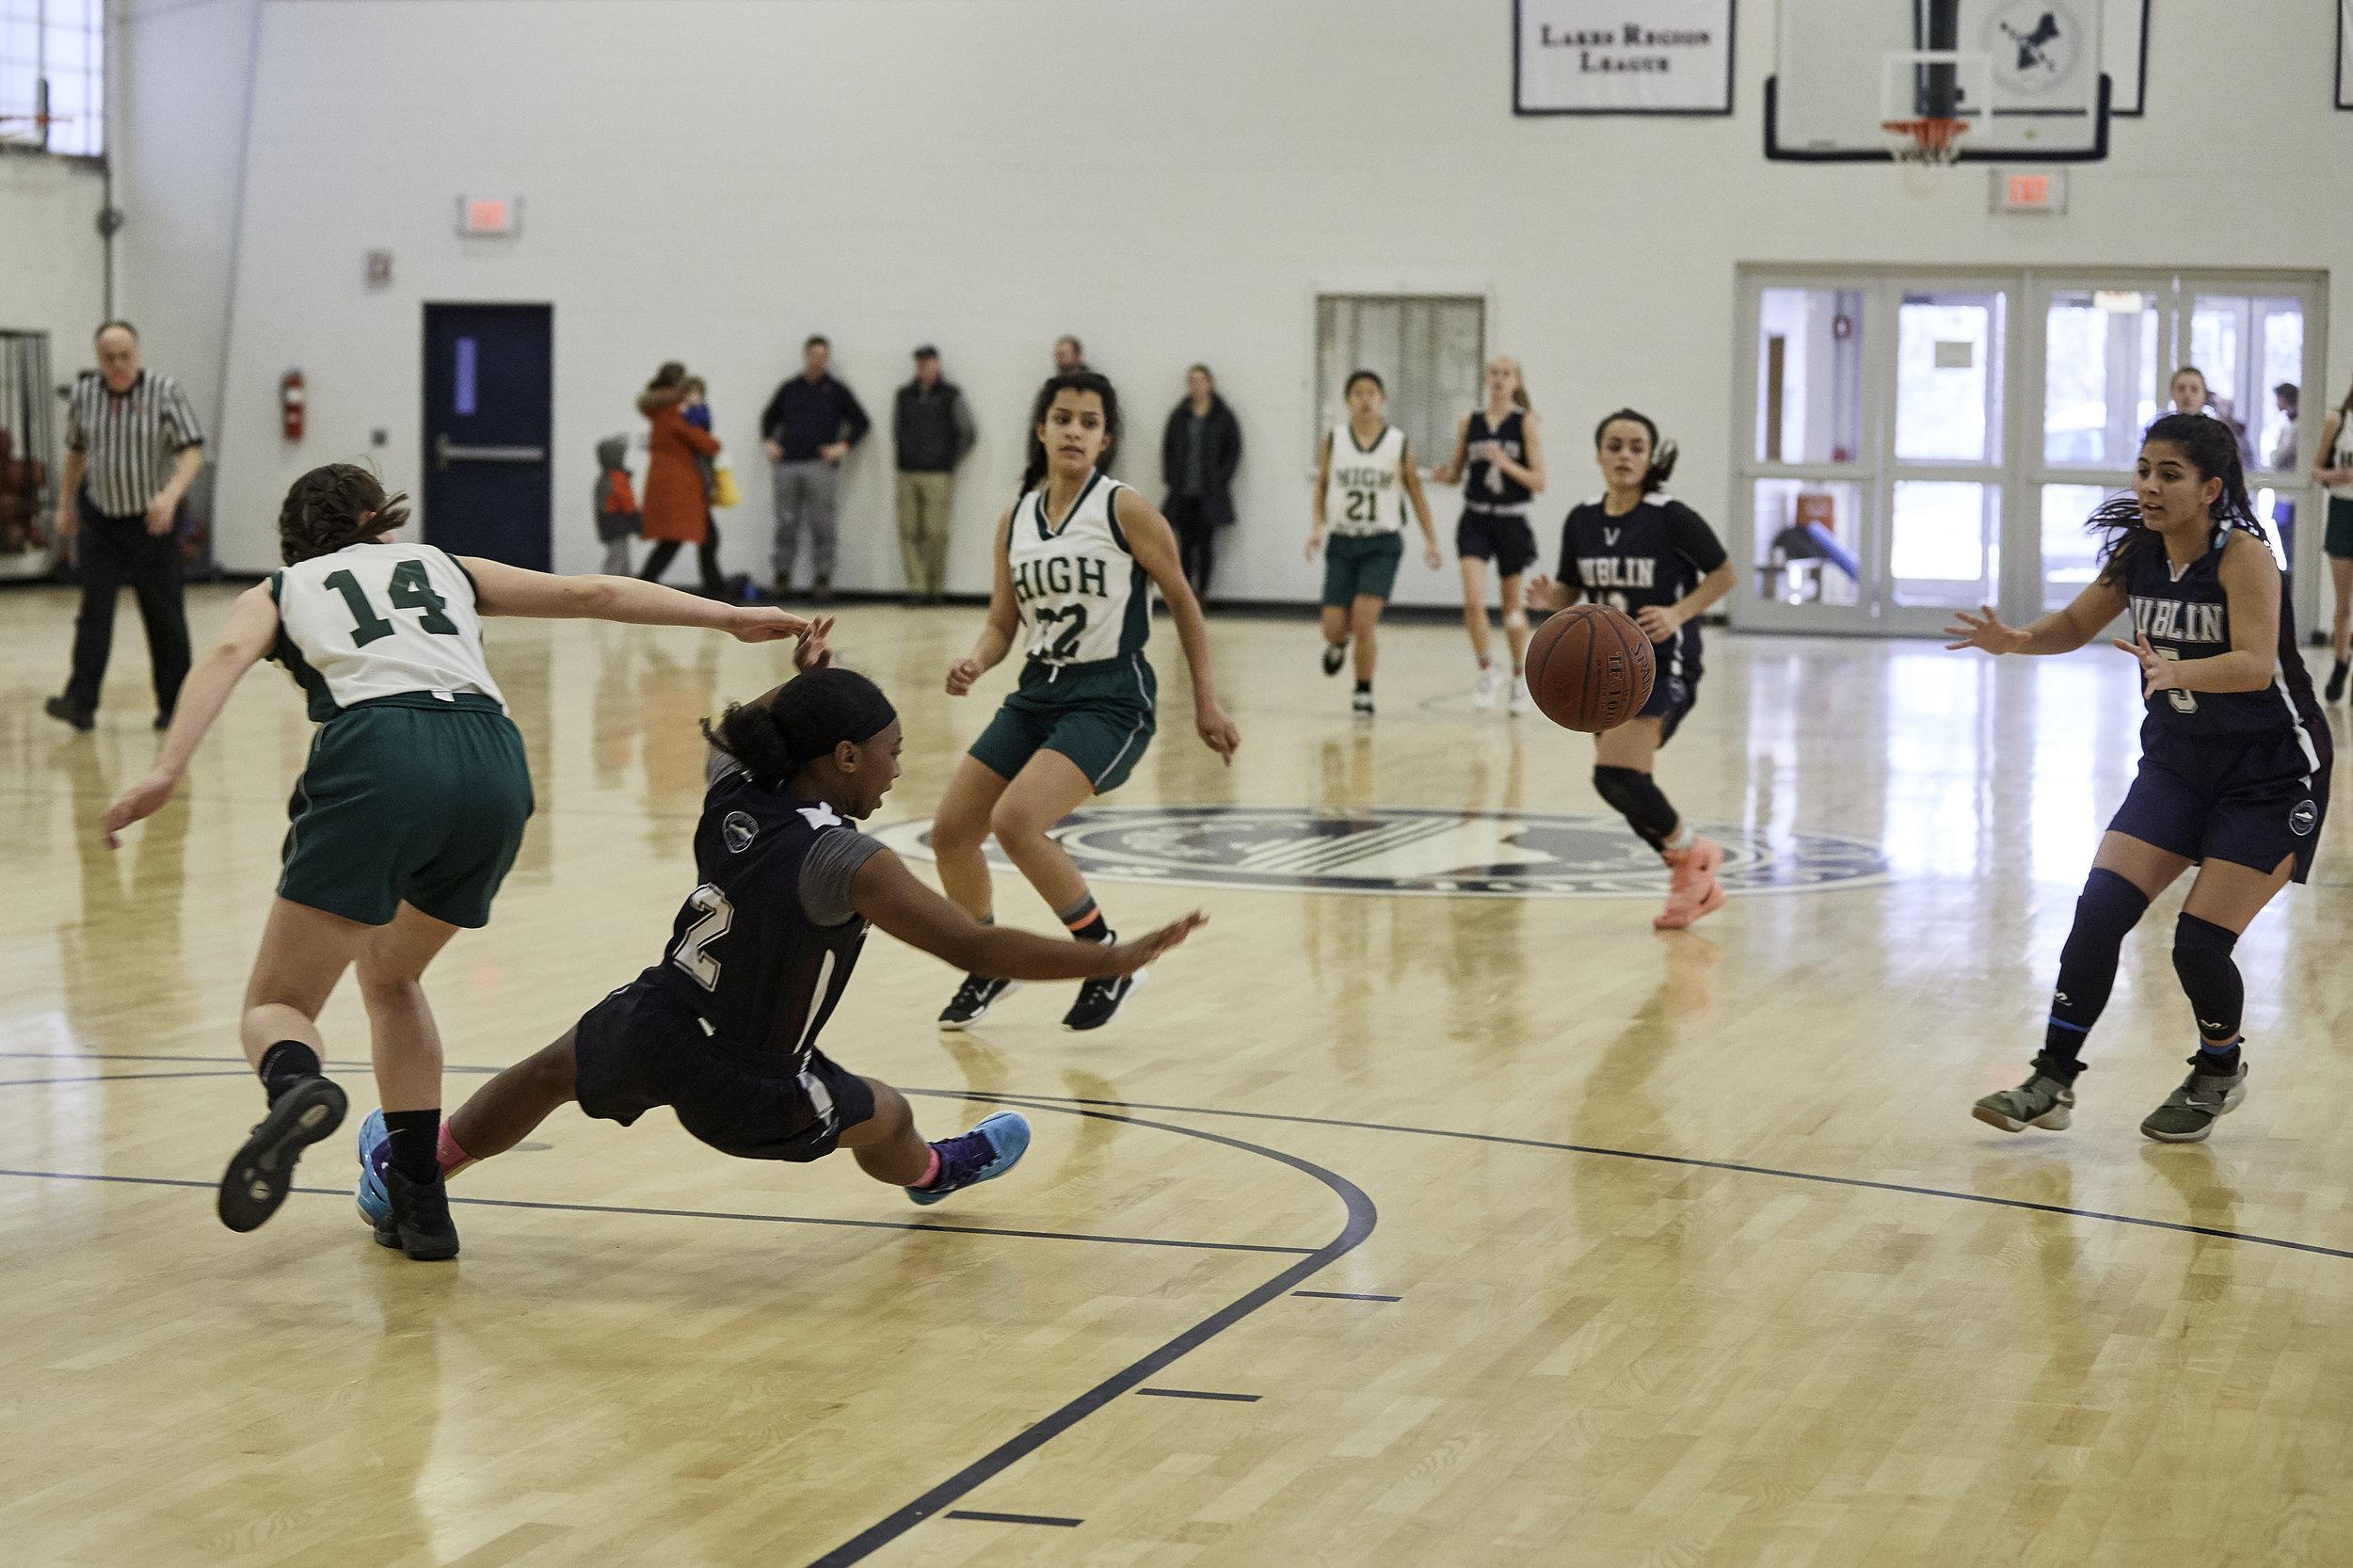 Basketball vs High Mowing School, February 2, 2019 - 166403.jpg